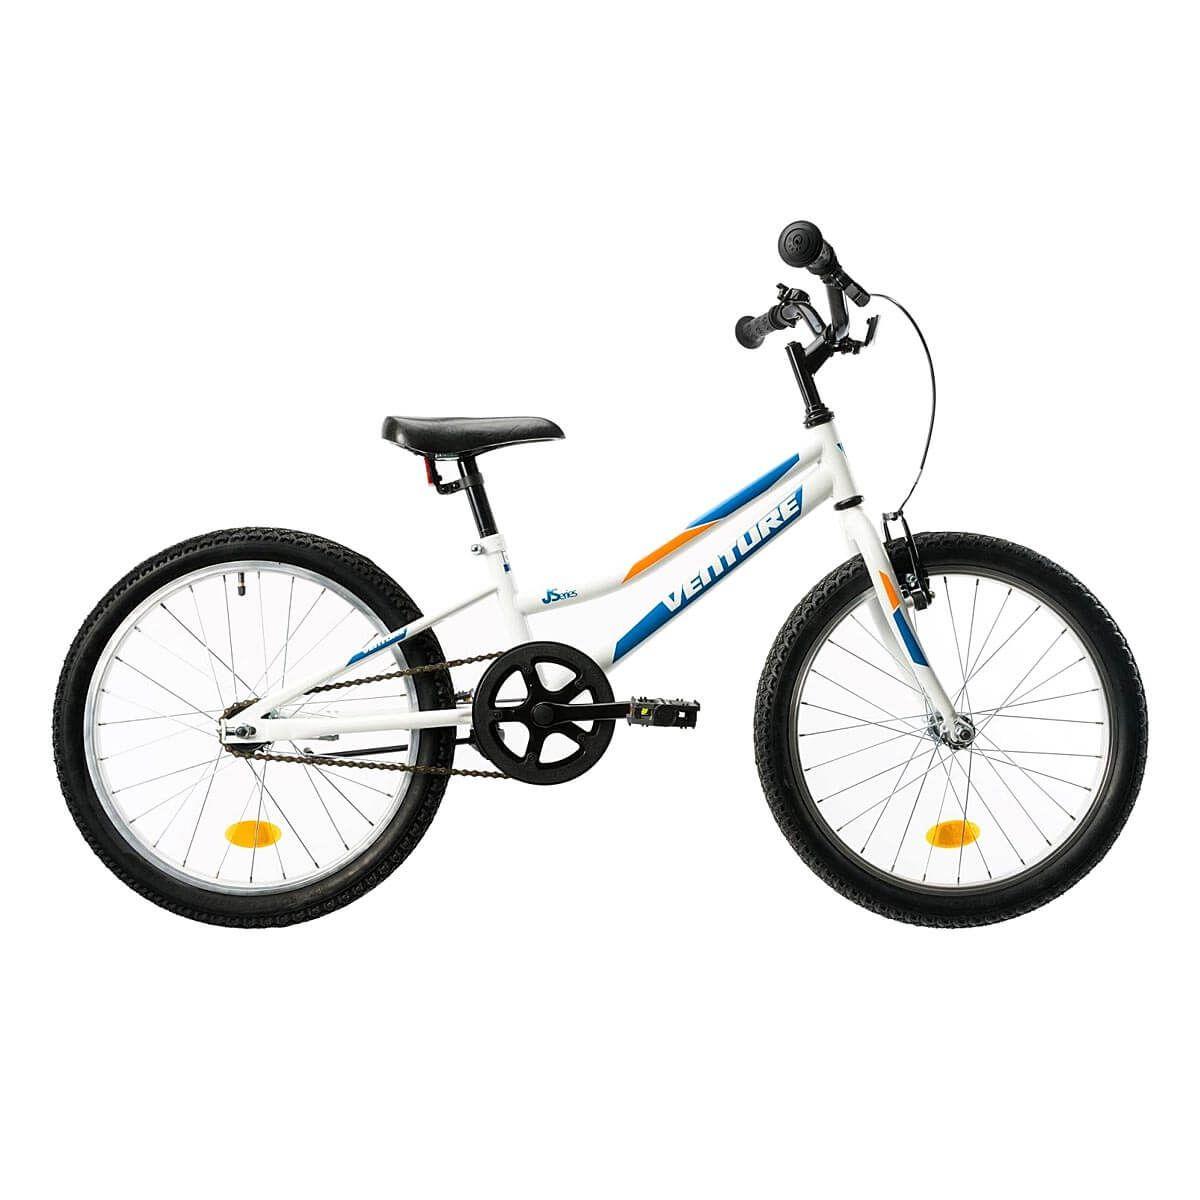 Bicicleta copii DHS Venture 2011, 20 inch, Alb-Albastru